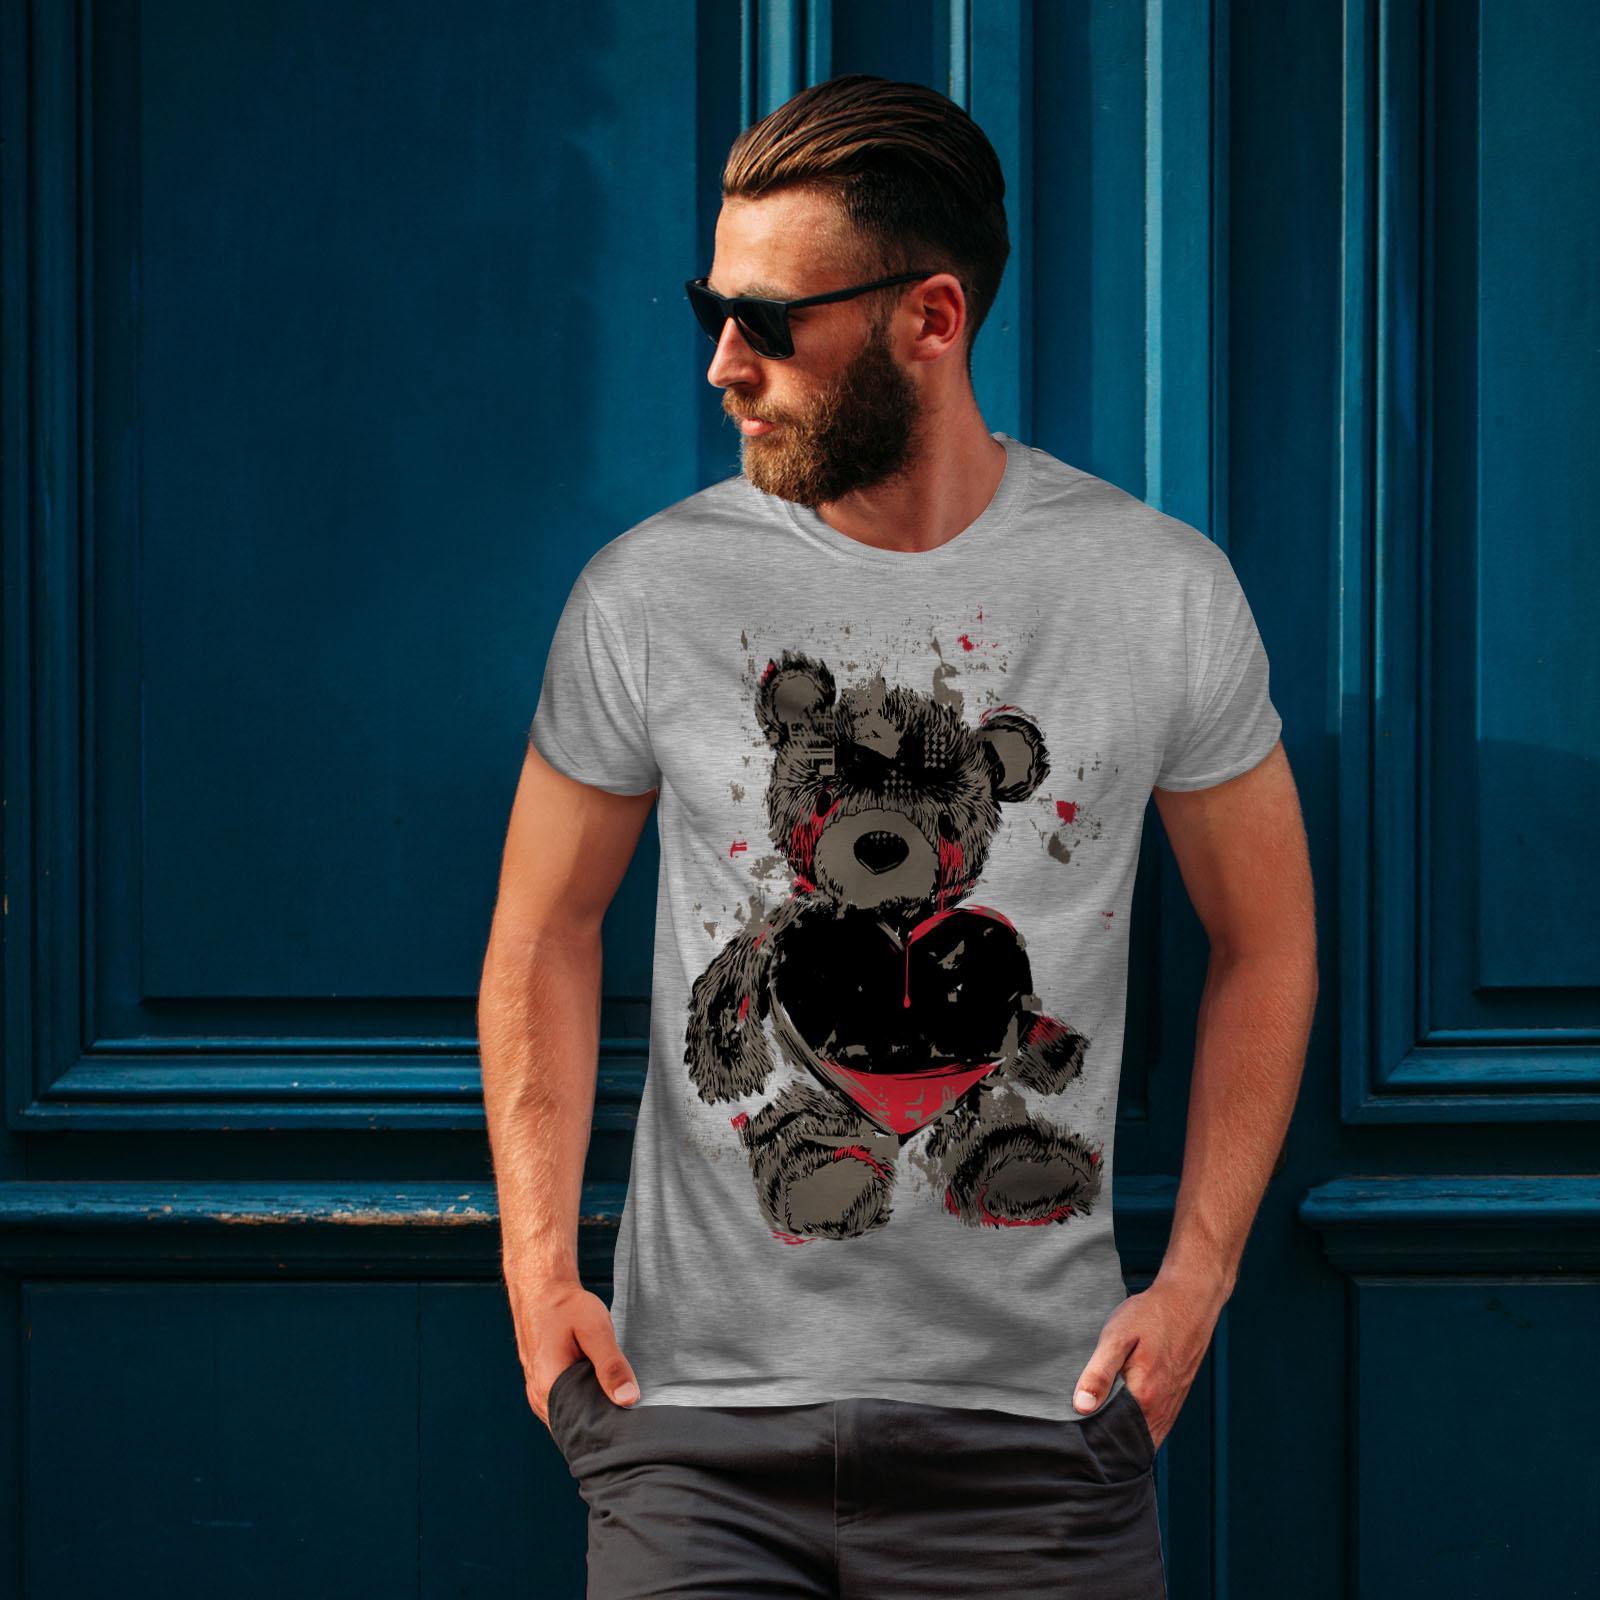 miniature 16 - Wellcoda Teddy Bear Love Hurt Mens T-shirt, Blood Graphic Design Printed Tee